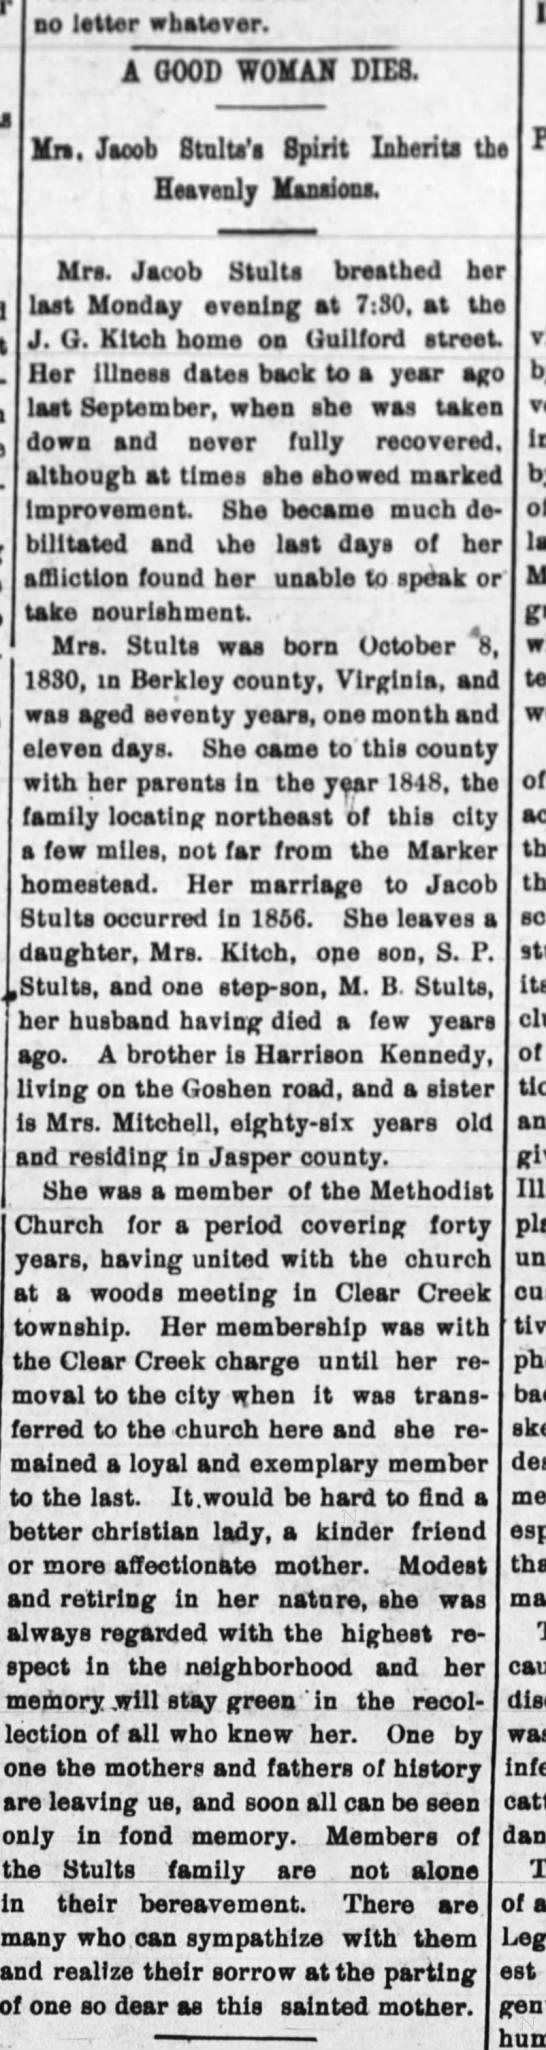 Harrison Kennedy sister dies 23 Nov 1900 - - no letter whatever. A GOOD WOMAN DIE8, Vm....